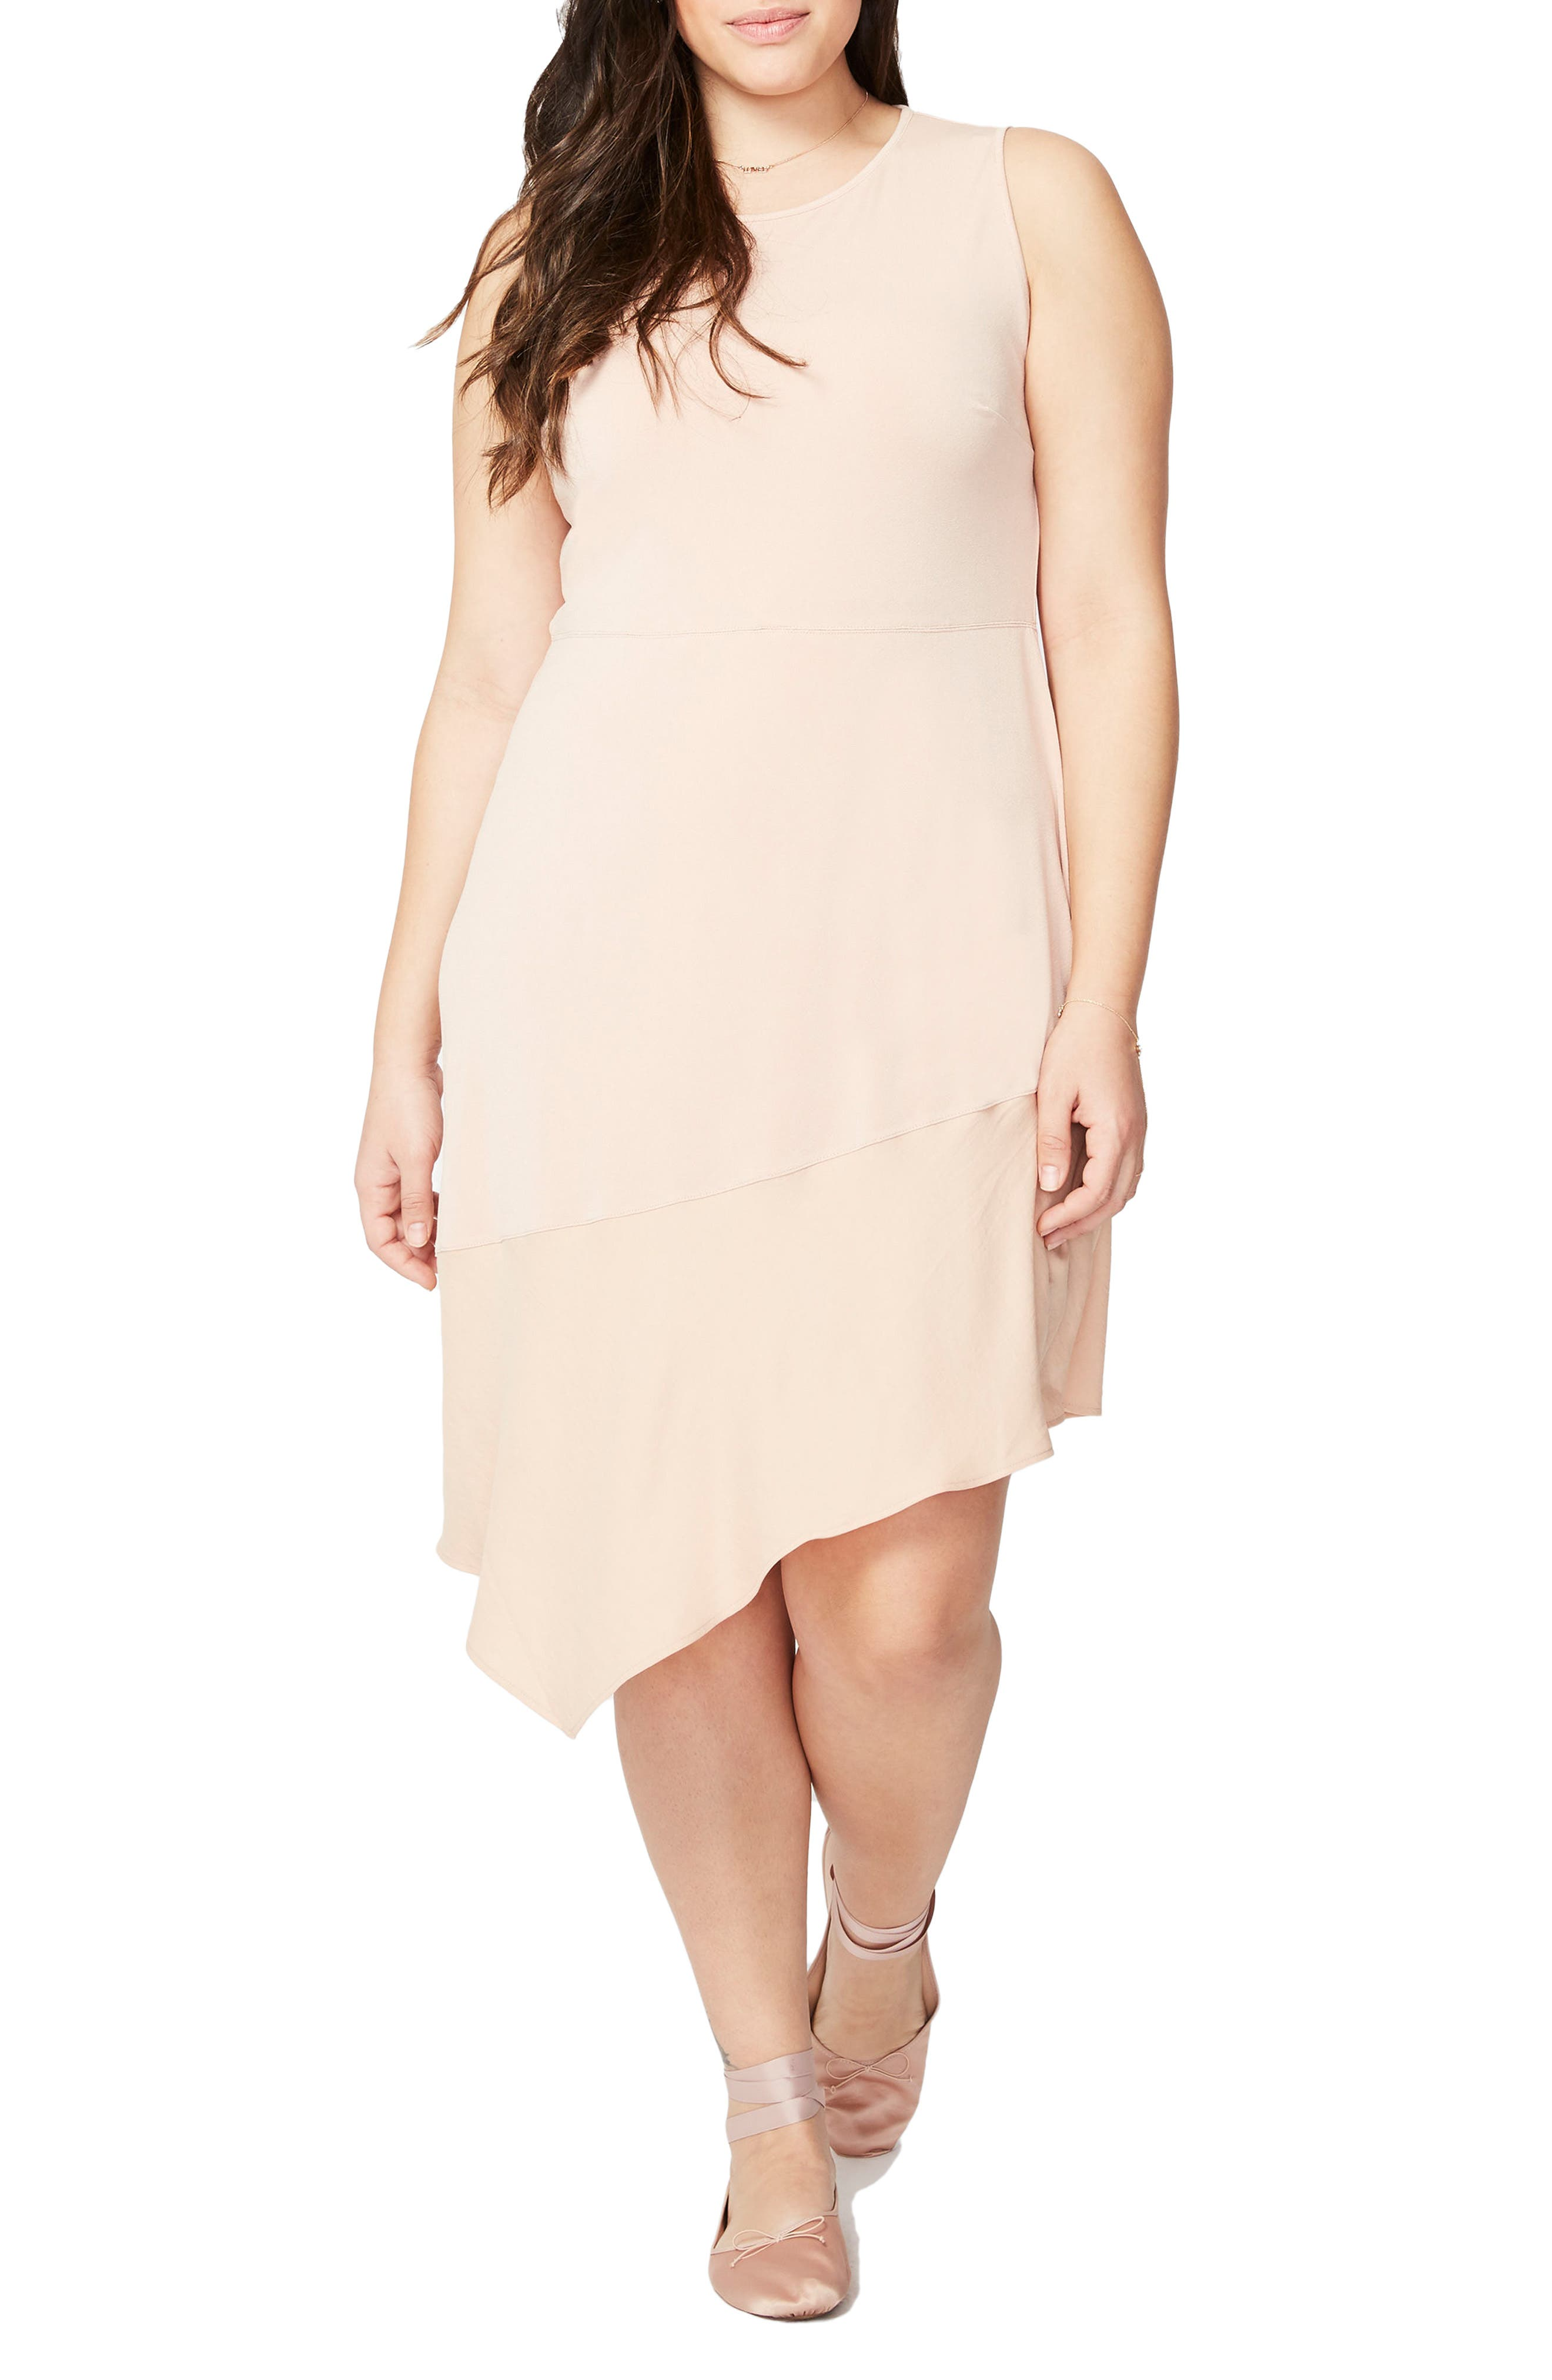 Alternate Image 1 Selected - RACHEL Rachel Roy Asymmetrical Flounce Dress (Plus Size)